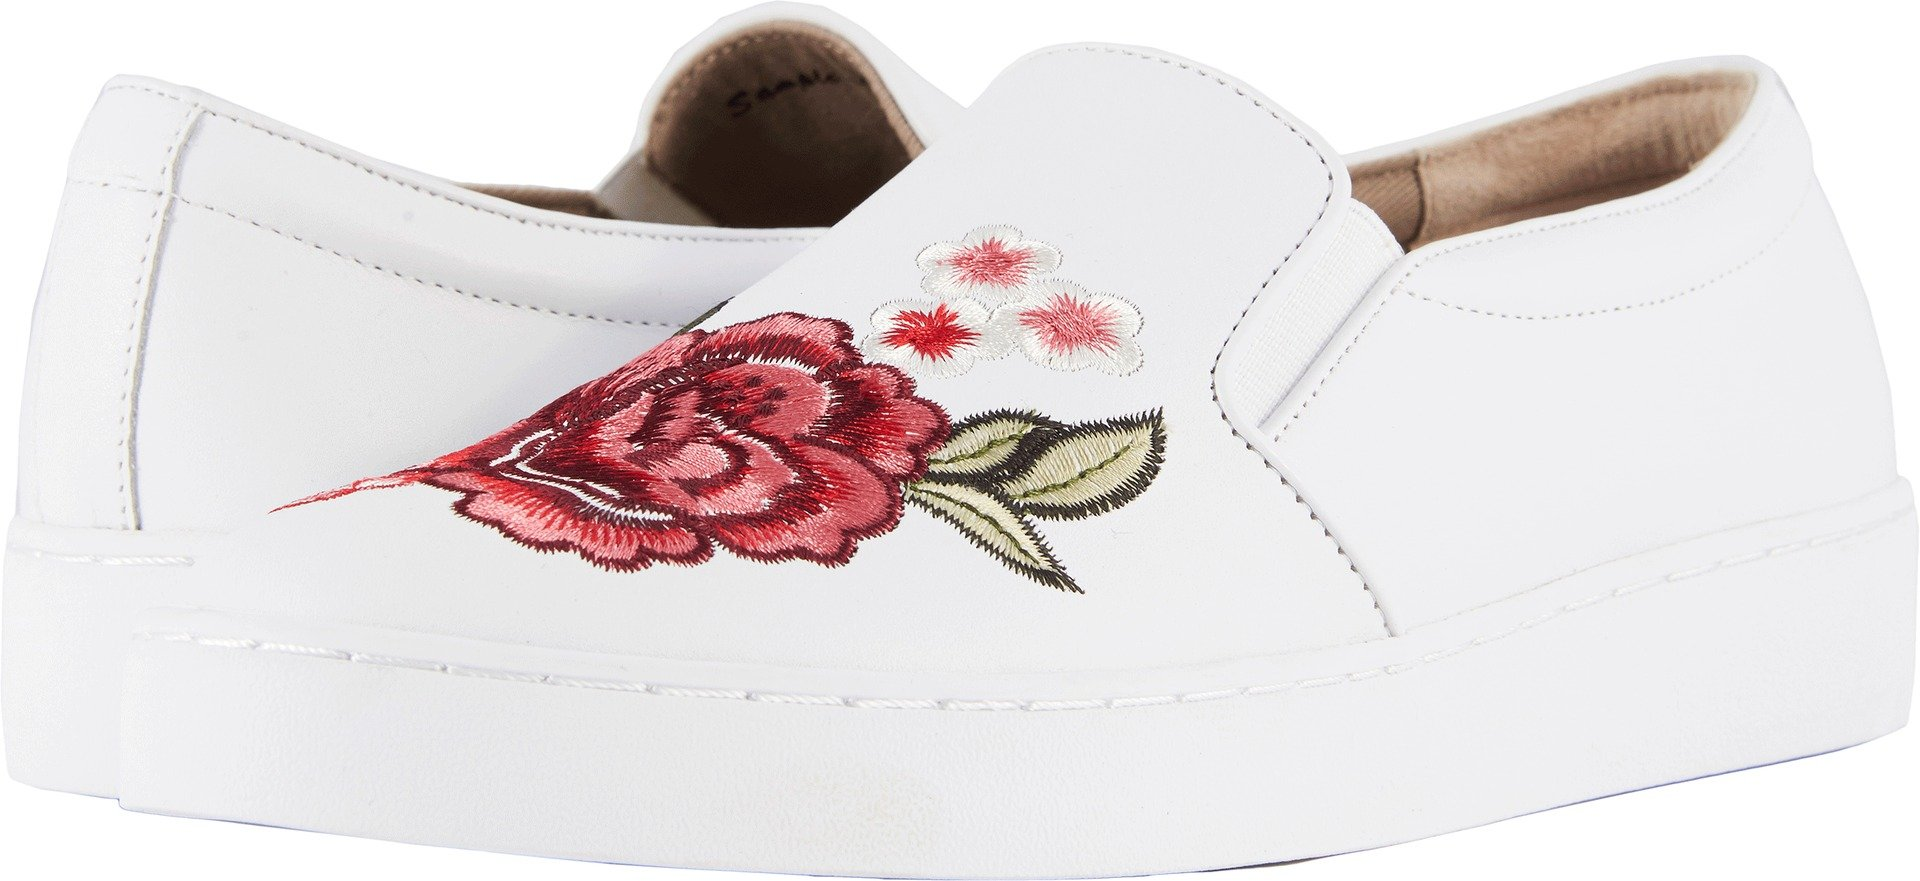 Vionic Womens Midi Floral Slip-On Sneaker, White Floral, Size 5